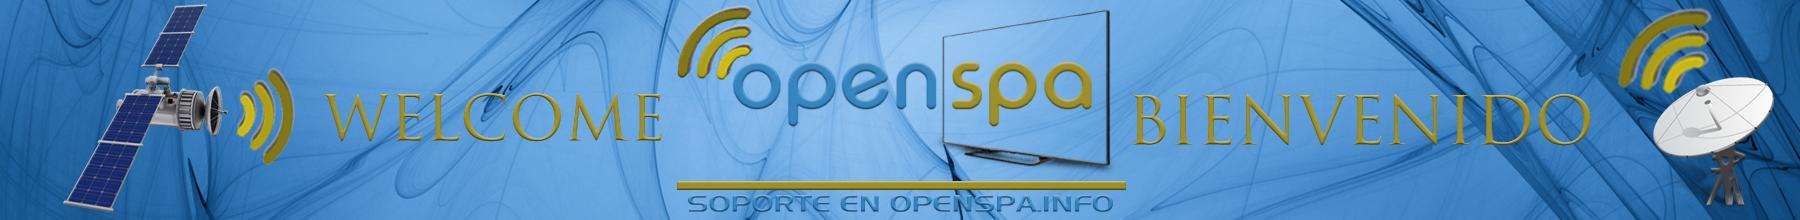 OpenSpa